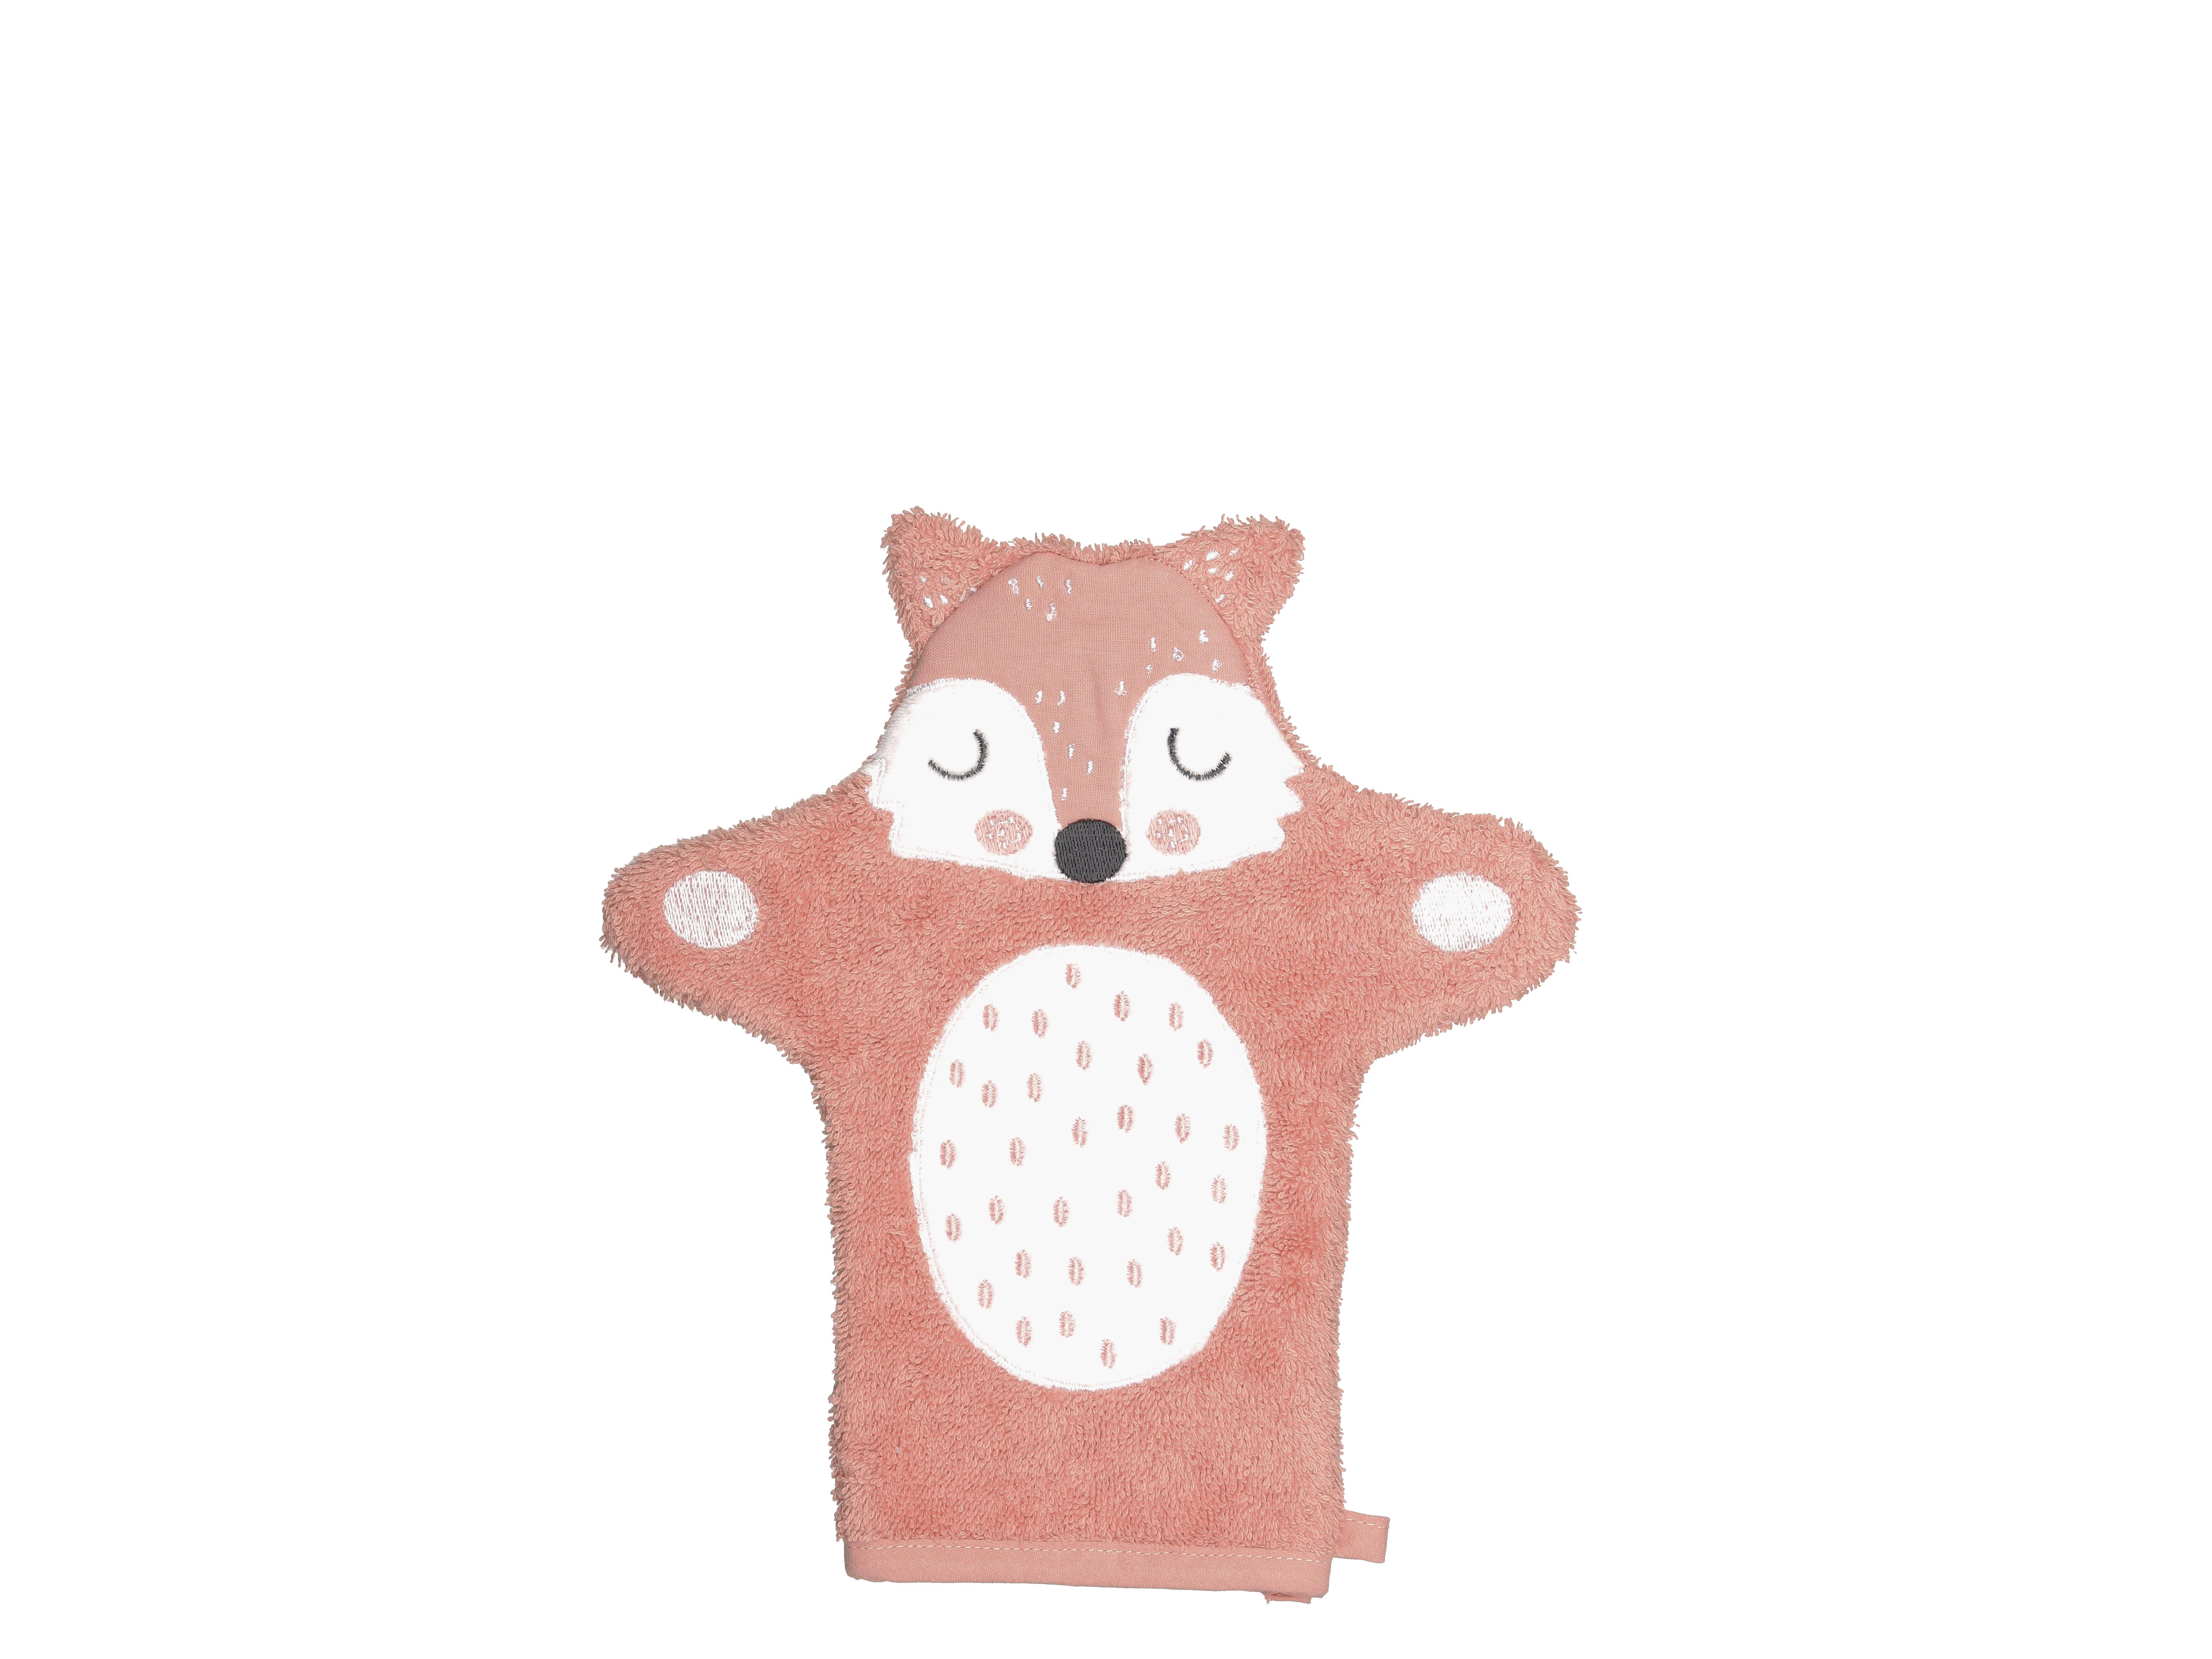 Södahl Frida Fox vaskehandske, 11x21 cm, orange